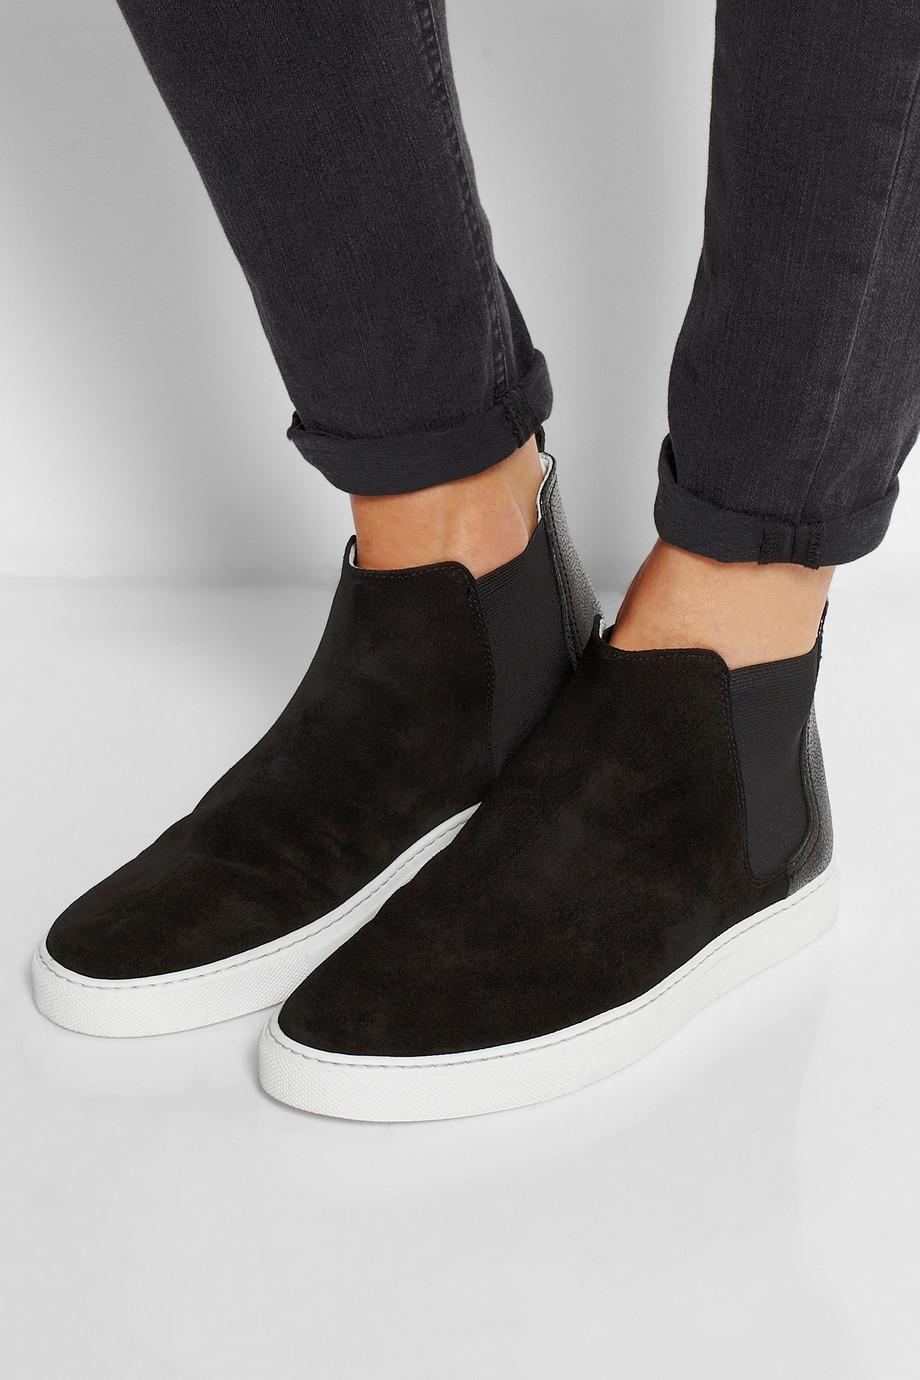 Lanvin Suede High-Top Slip-On Sneakers